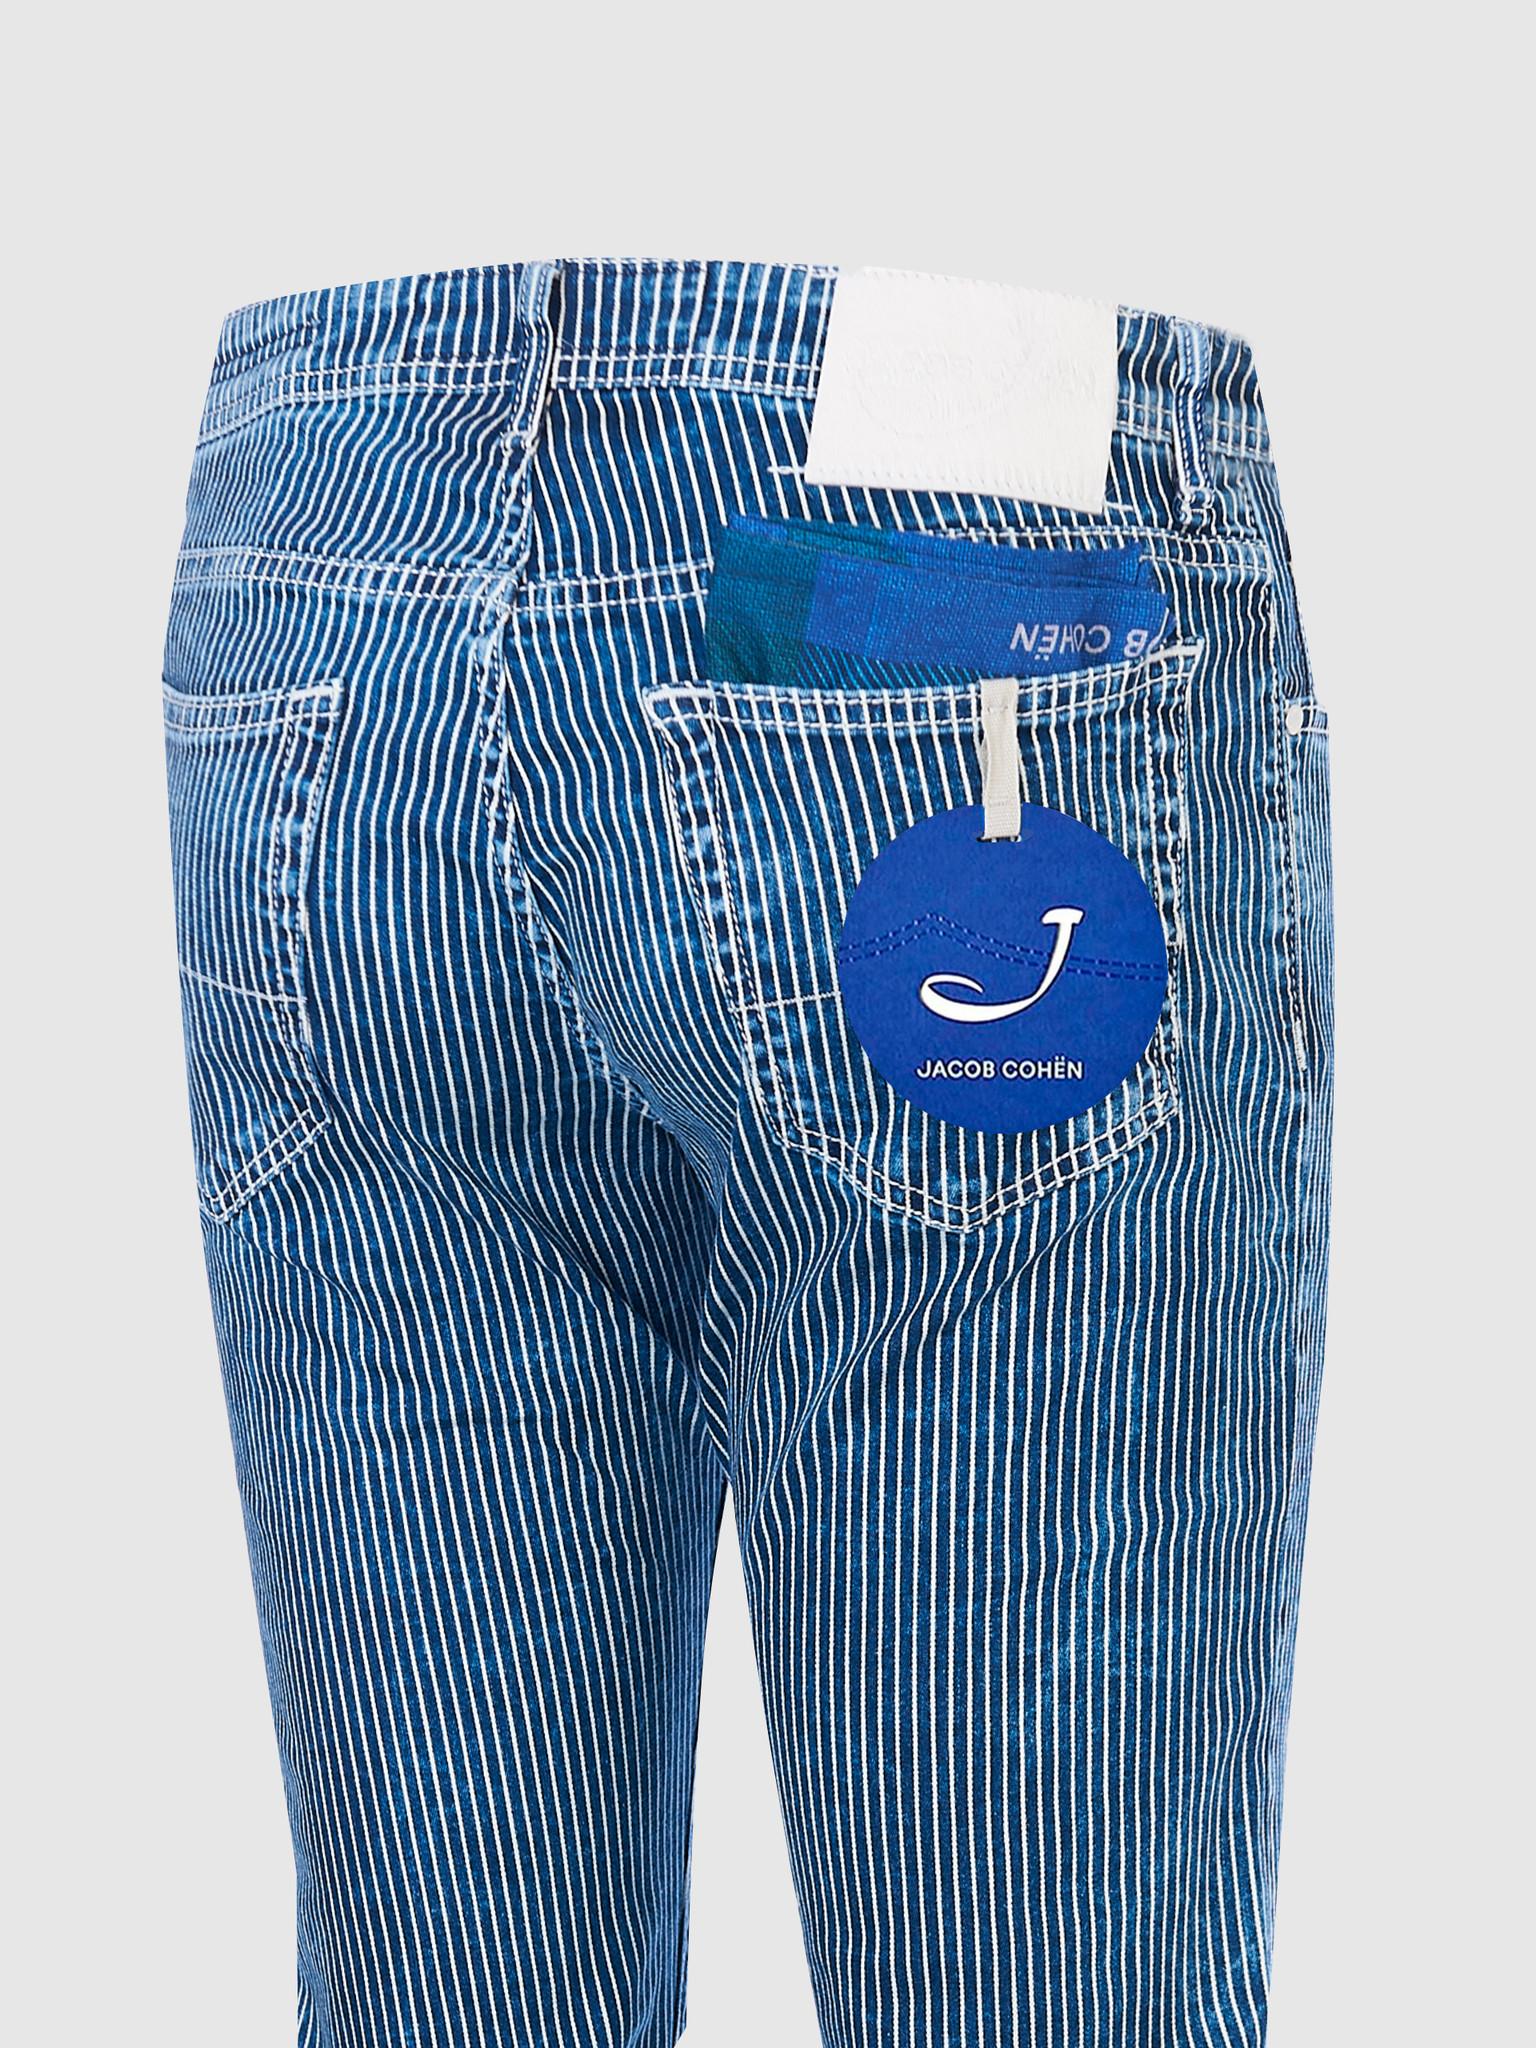 J688 Comf Jeans-3